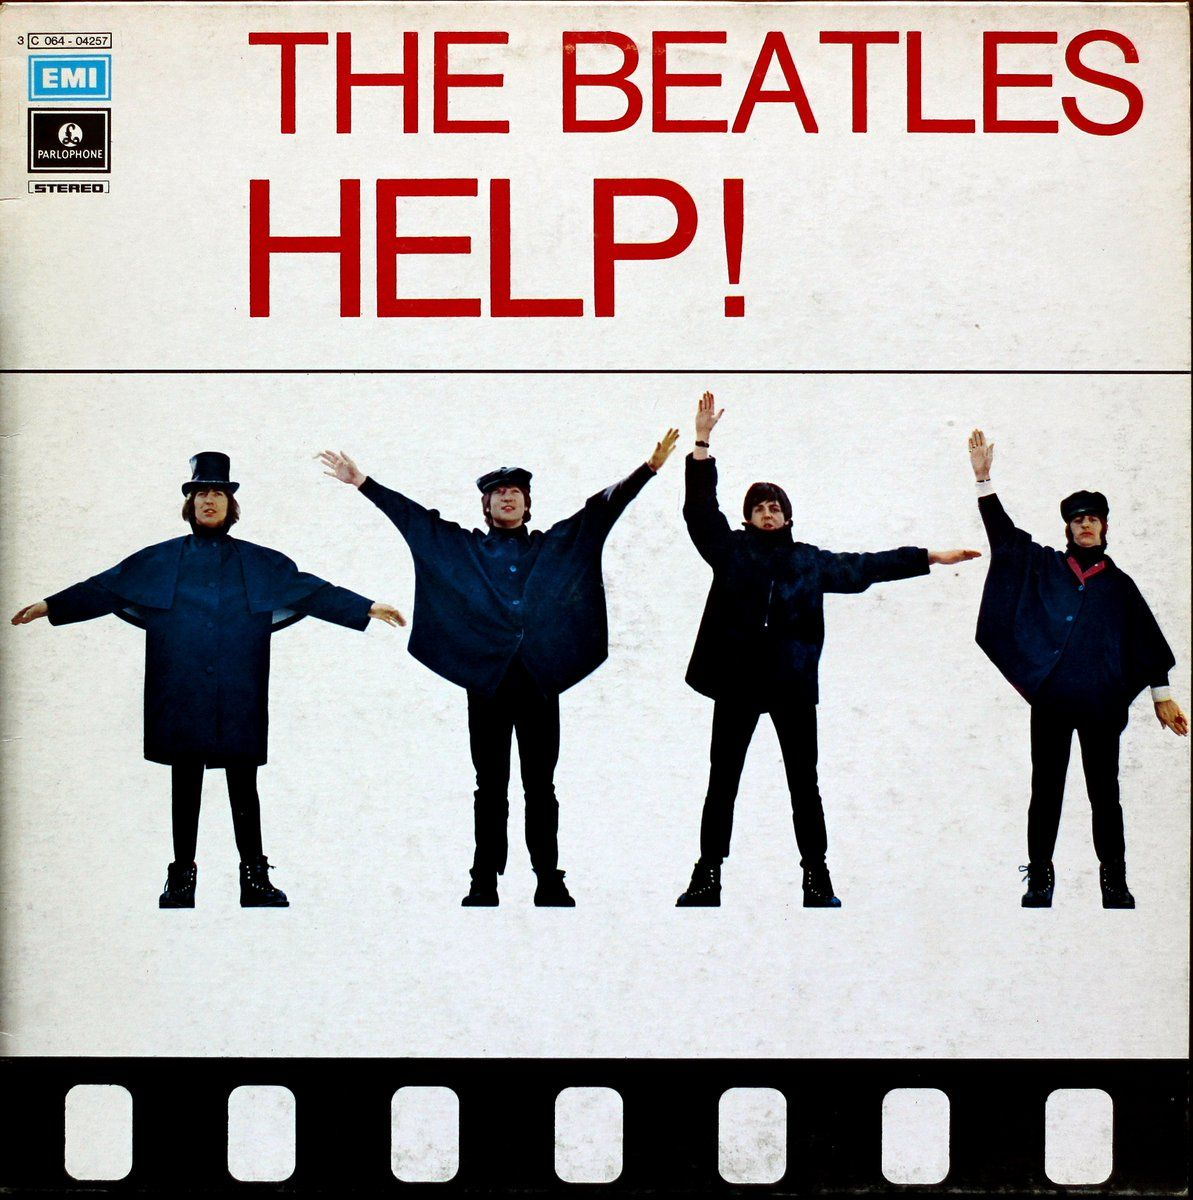 The Beatles, HELP! | The Beatles | The beatles yesterday